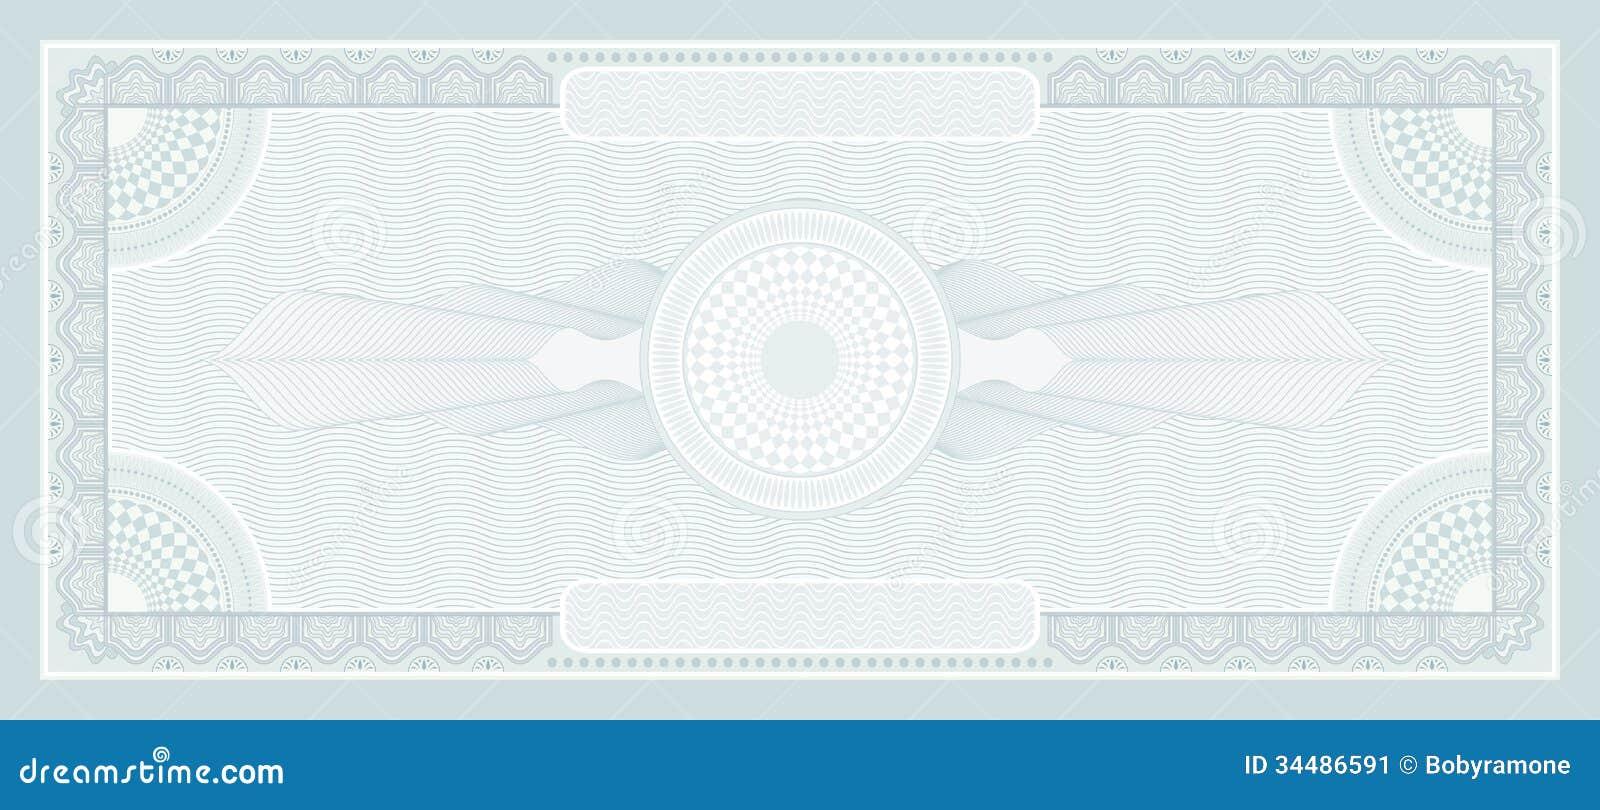 Money border template